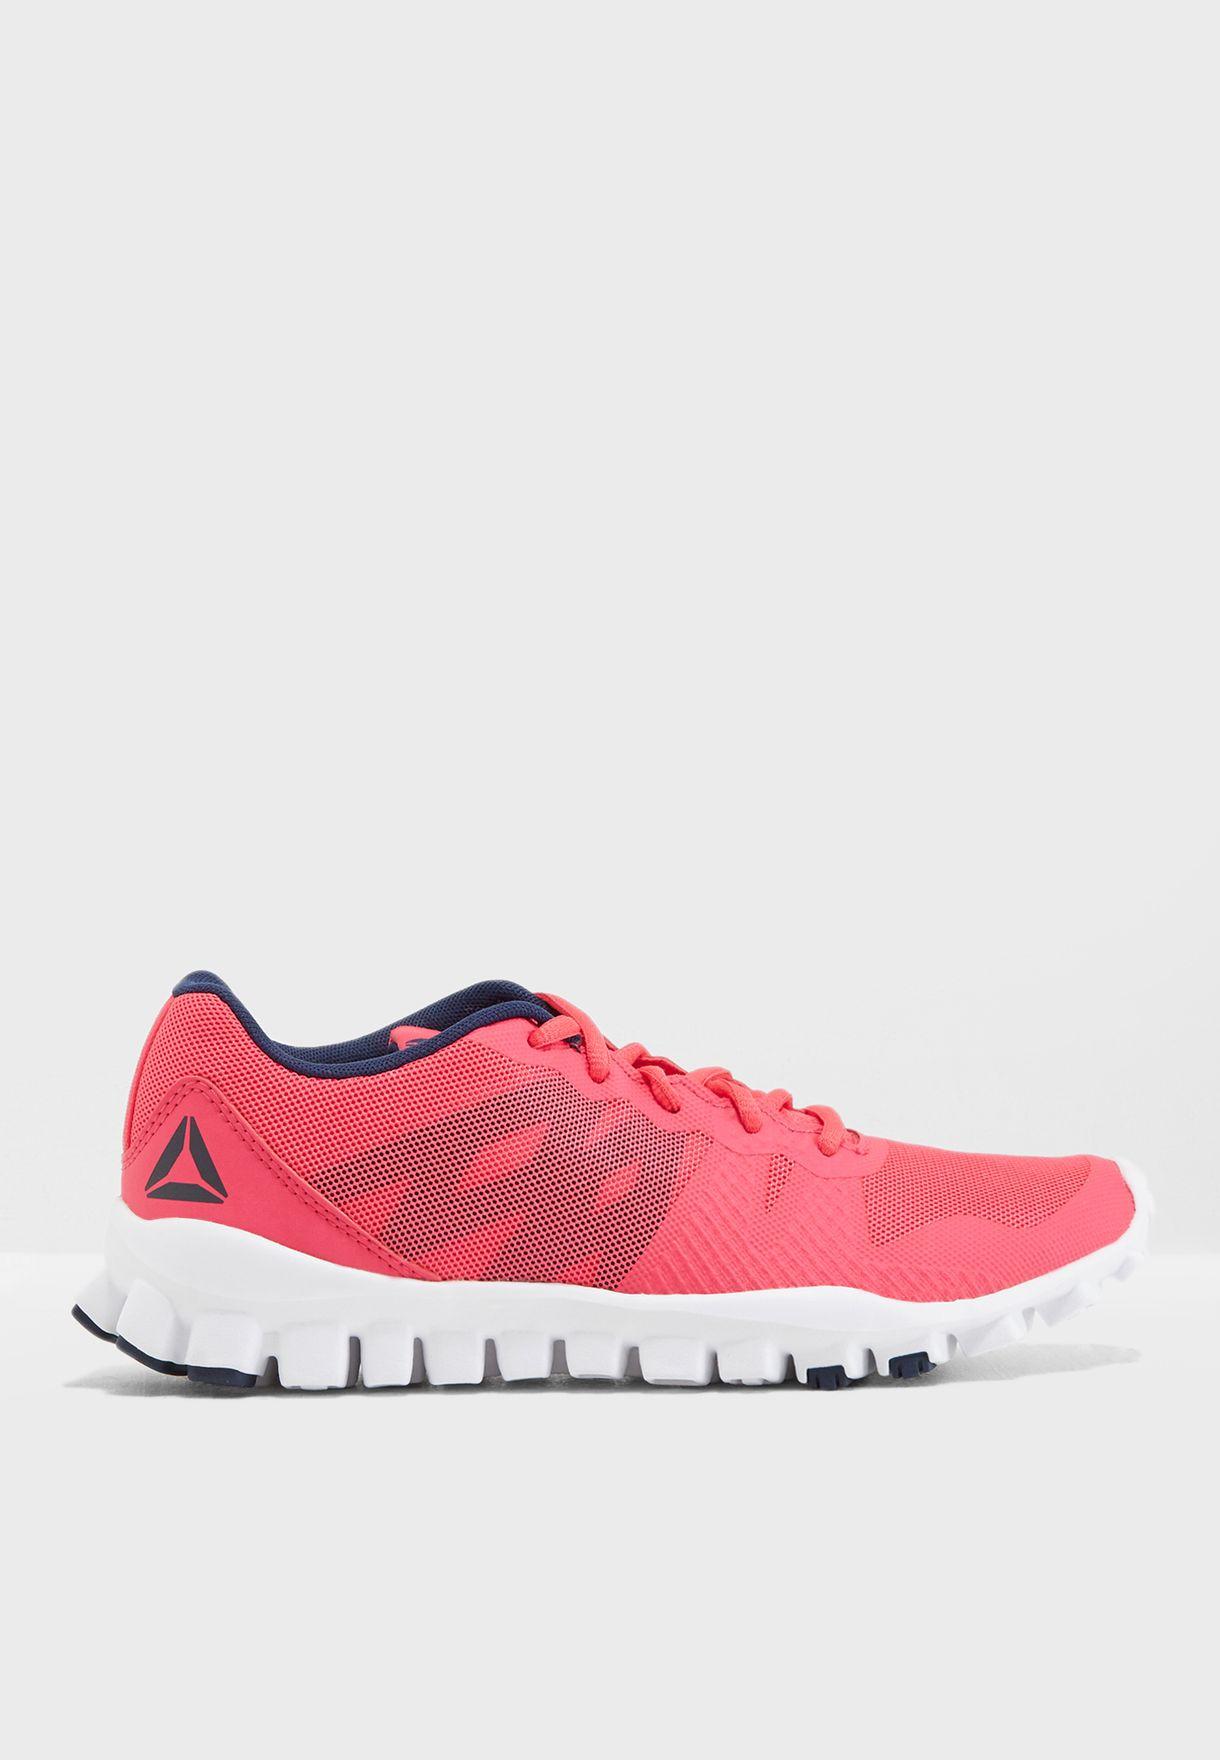 3a30b74d67fe9 Shop Reebok pink Youth Realflex Train 5.0 CN5002 for Kids in UAE ...